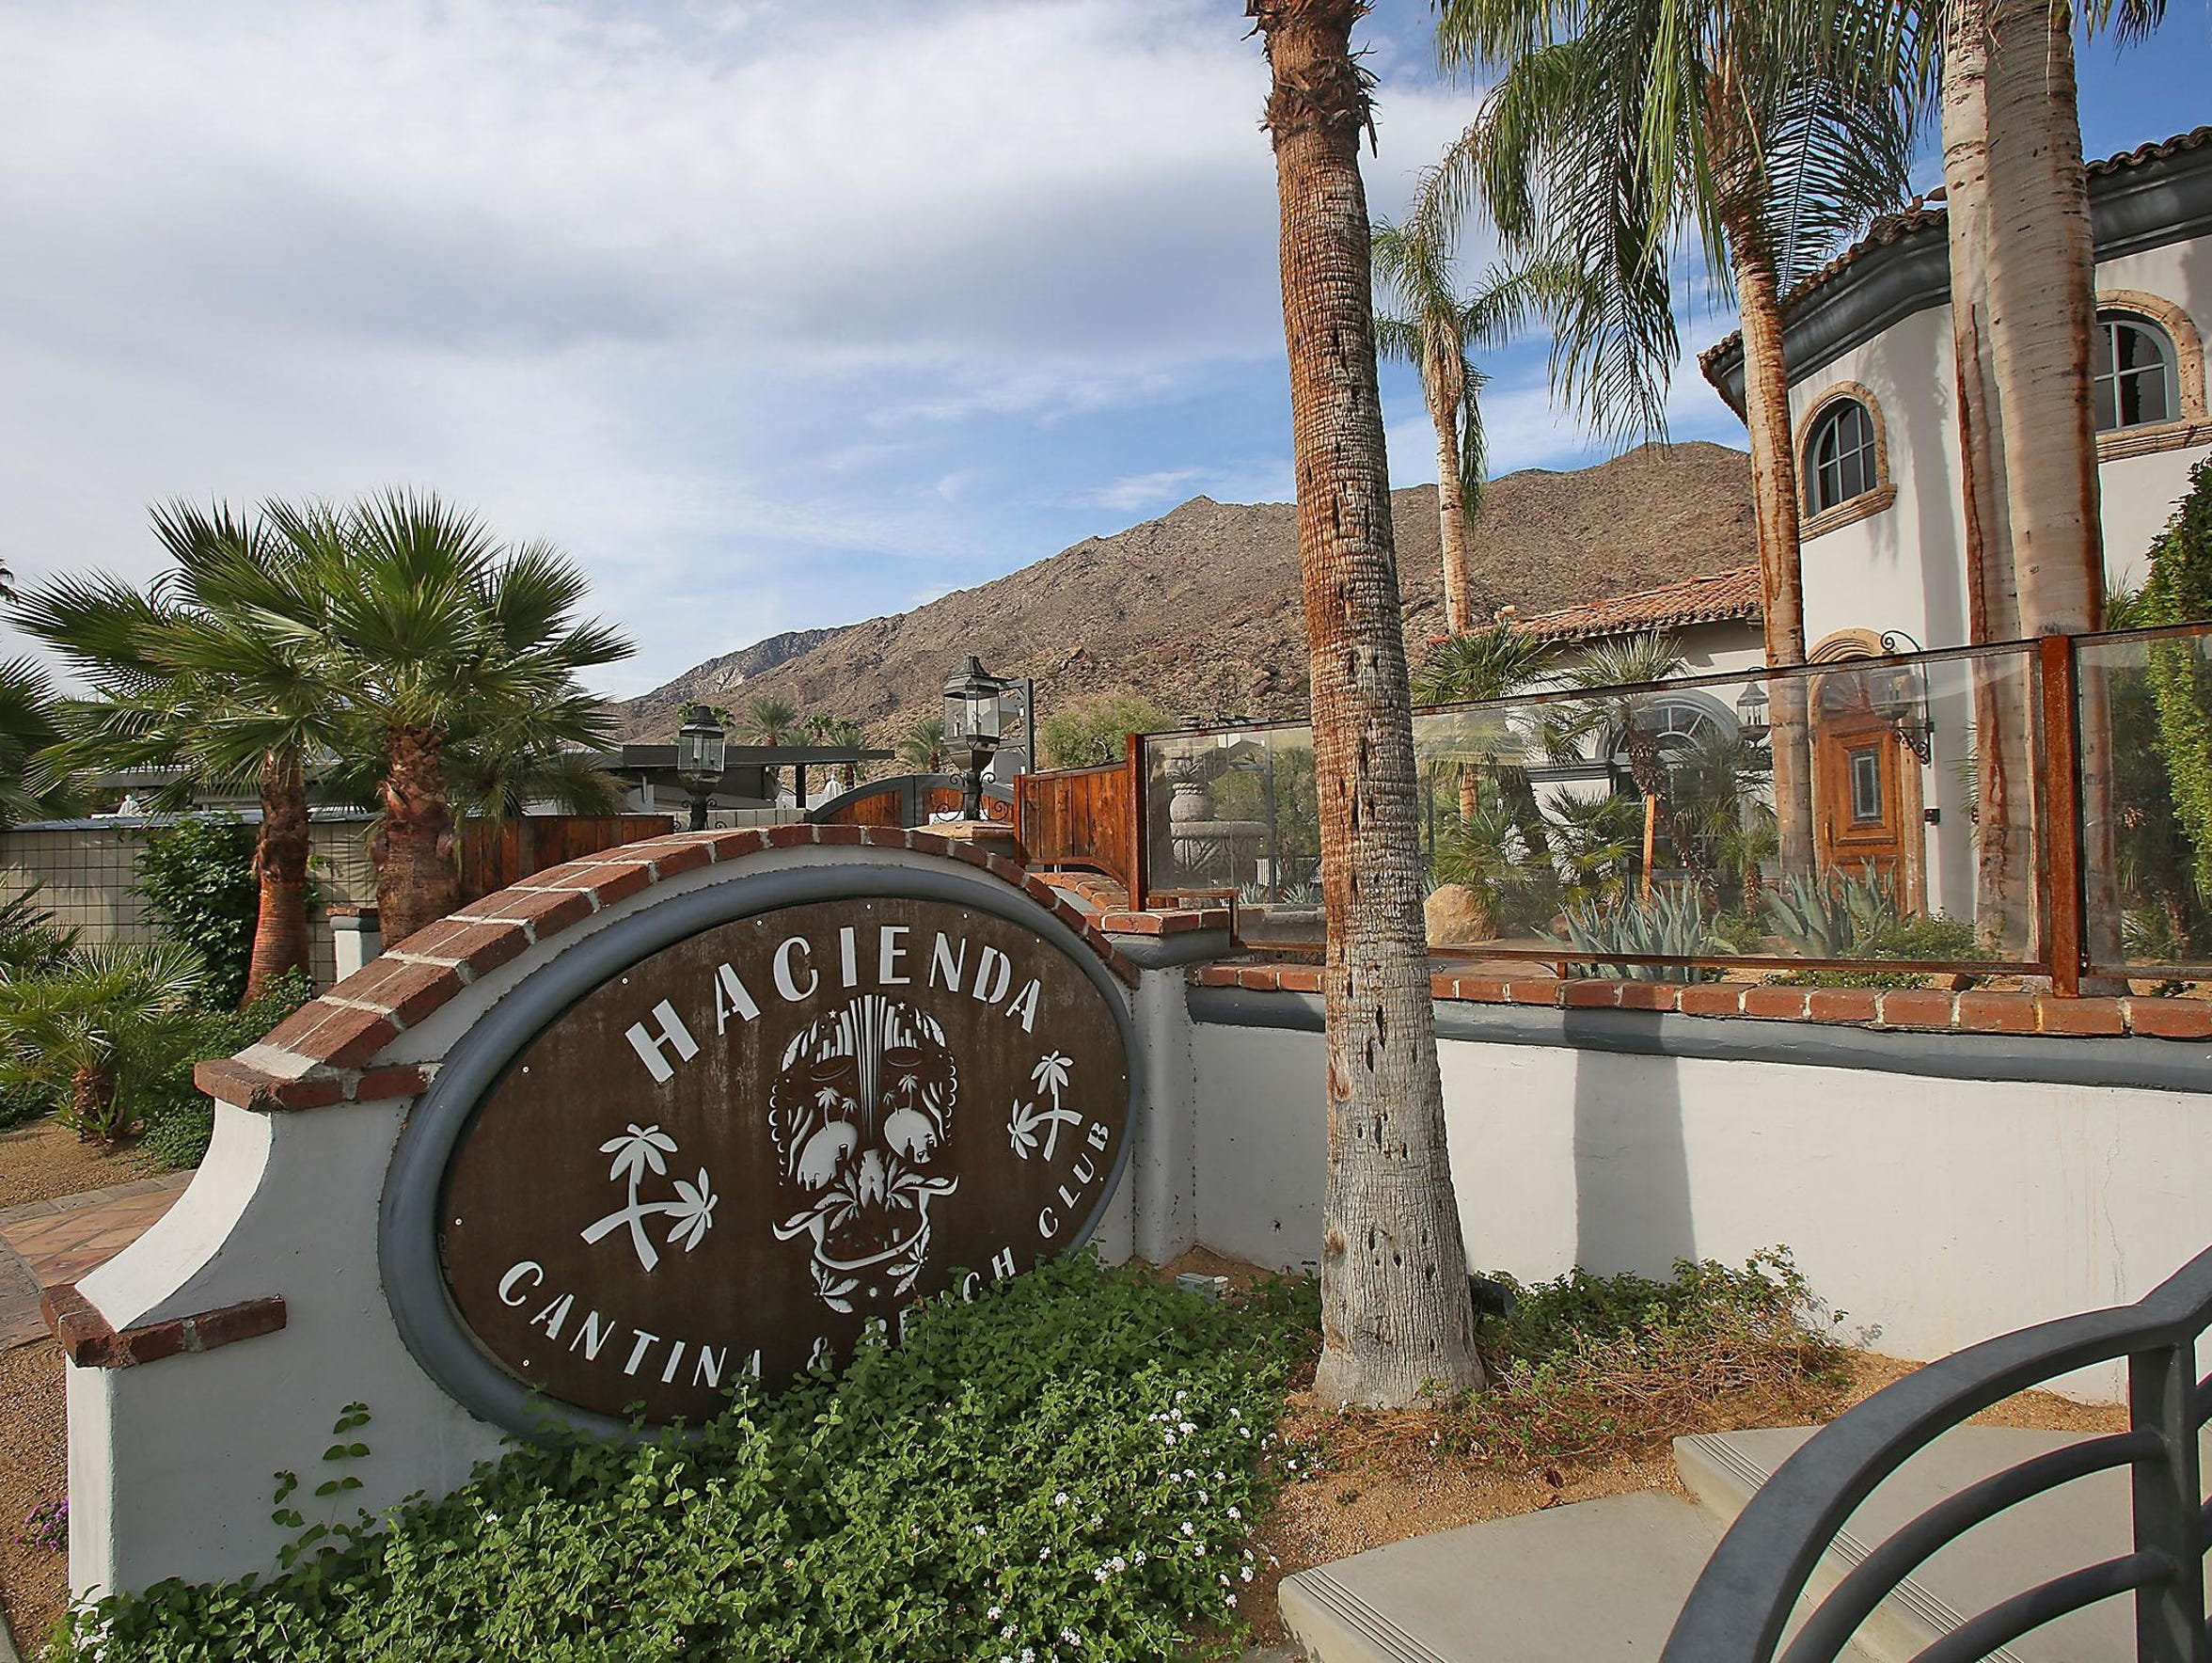 The Hacienda Cantina and Beach Club in Palm Springs.